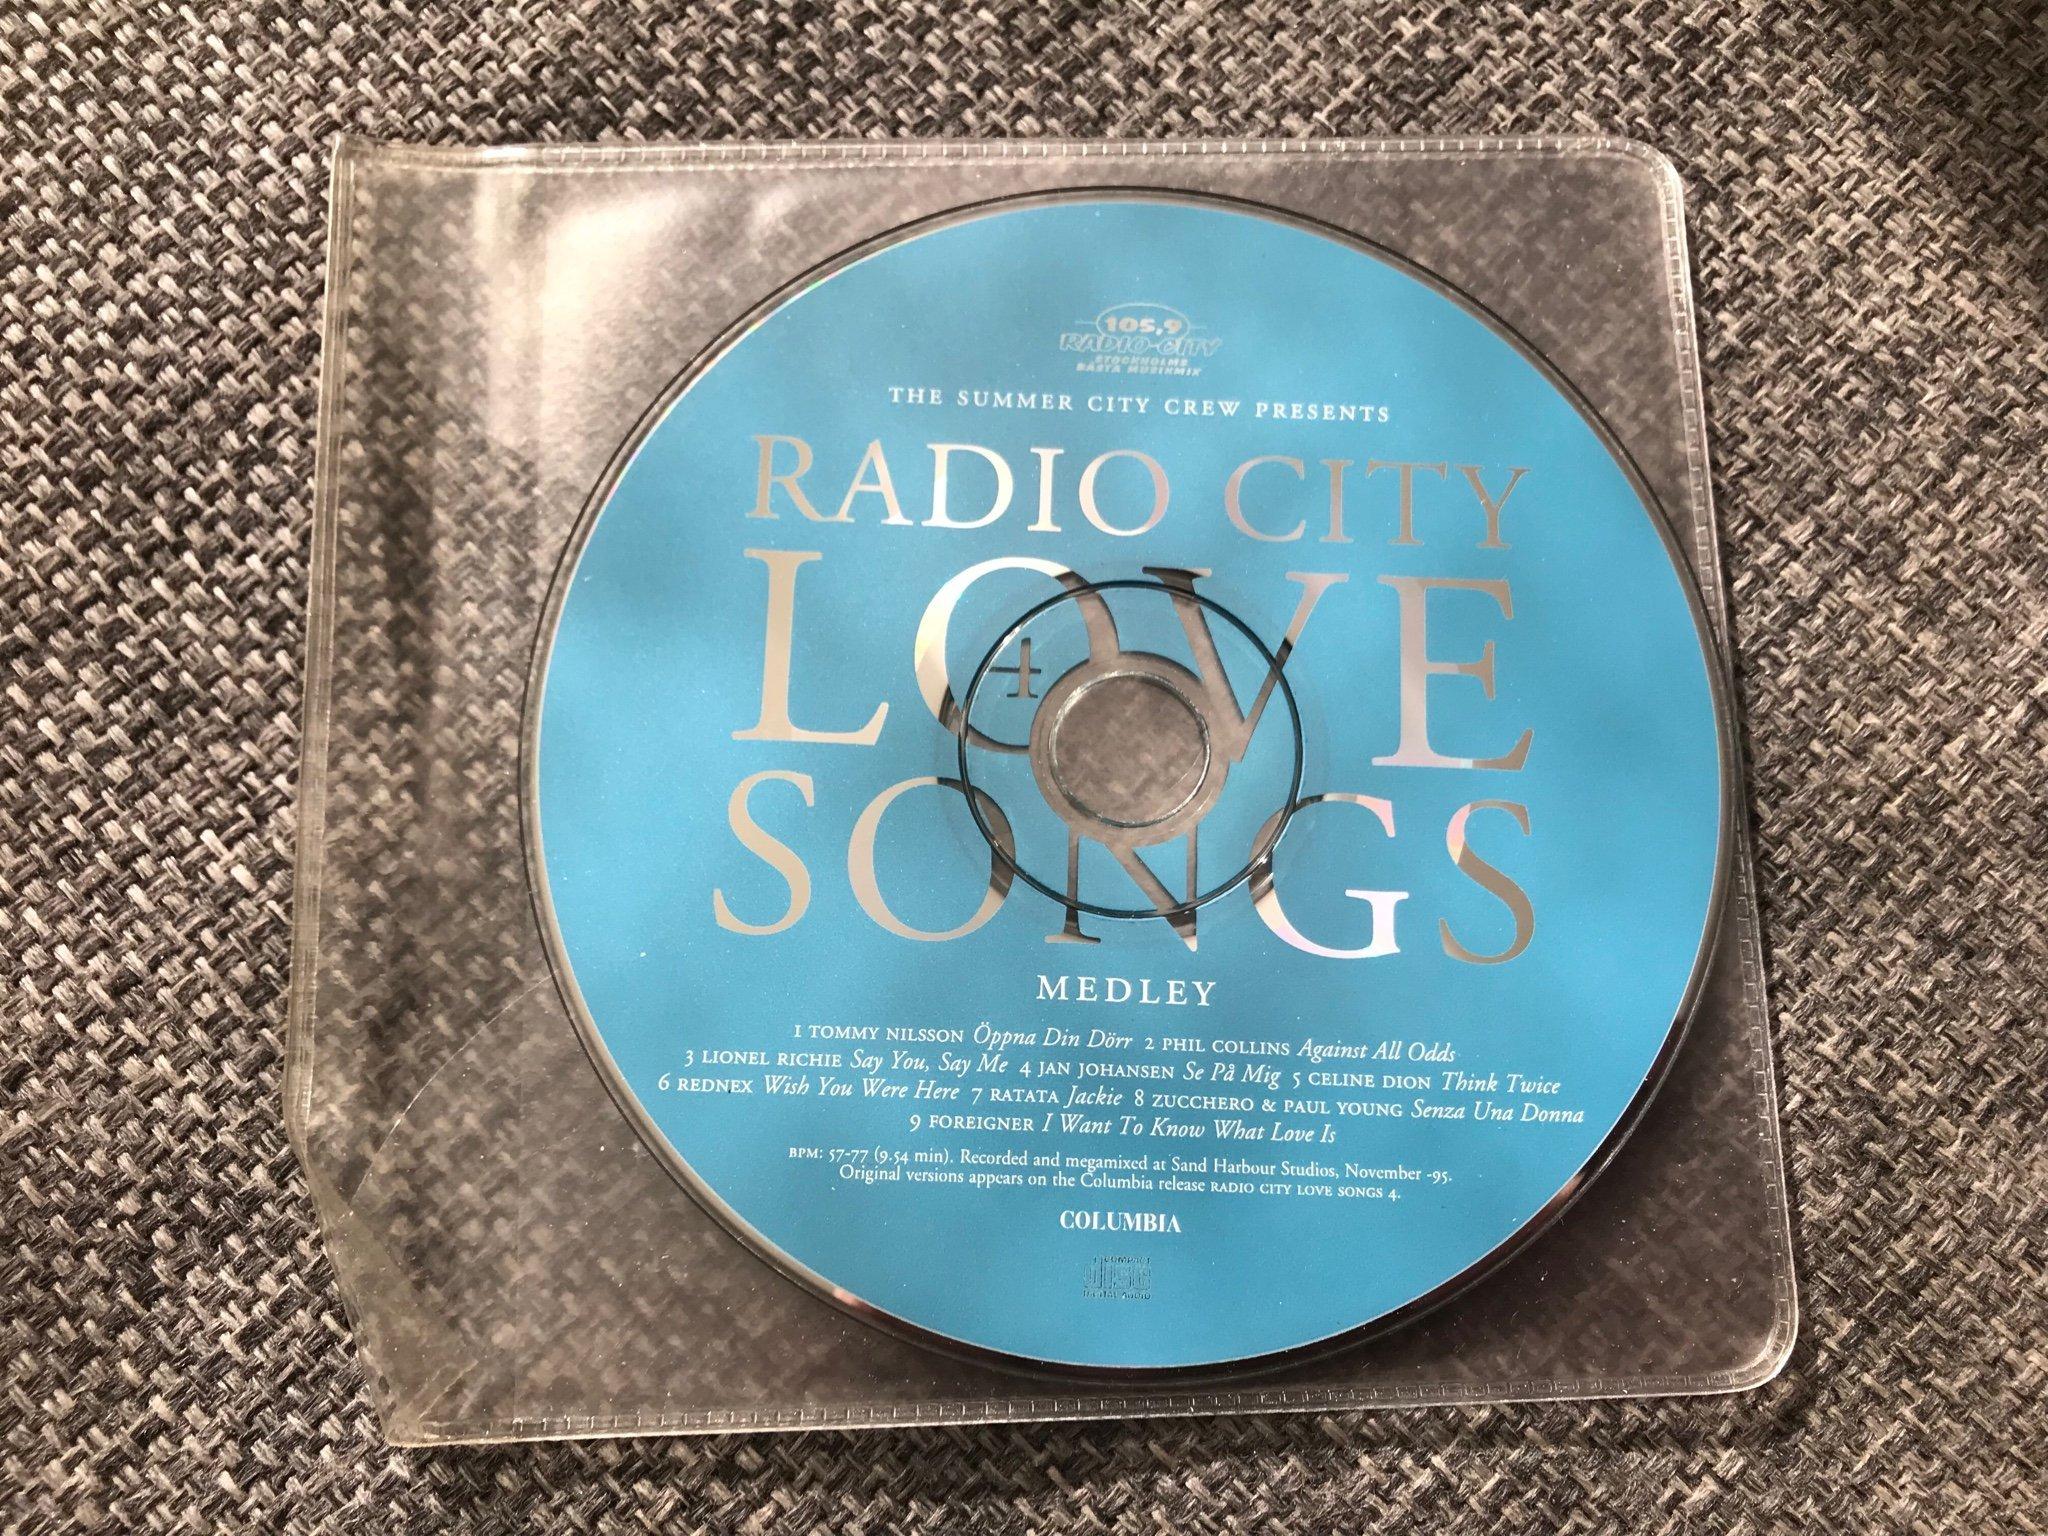 Radio City Lovesongs Medley / Megamix / PROMO -   (353036883